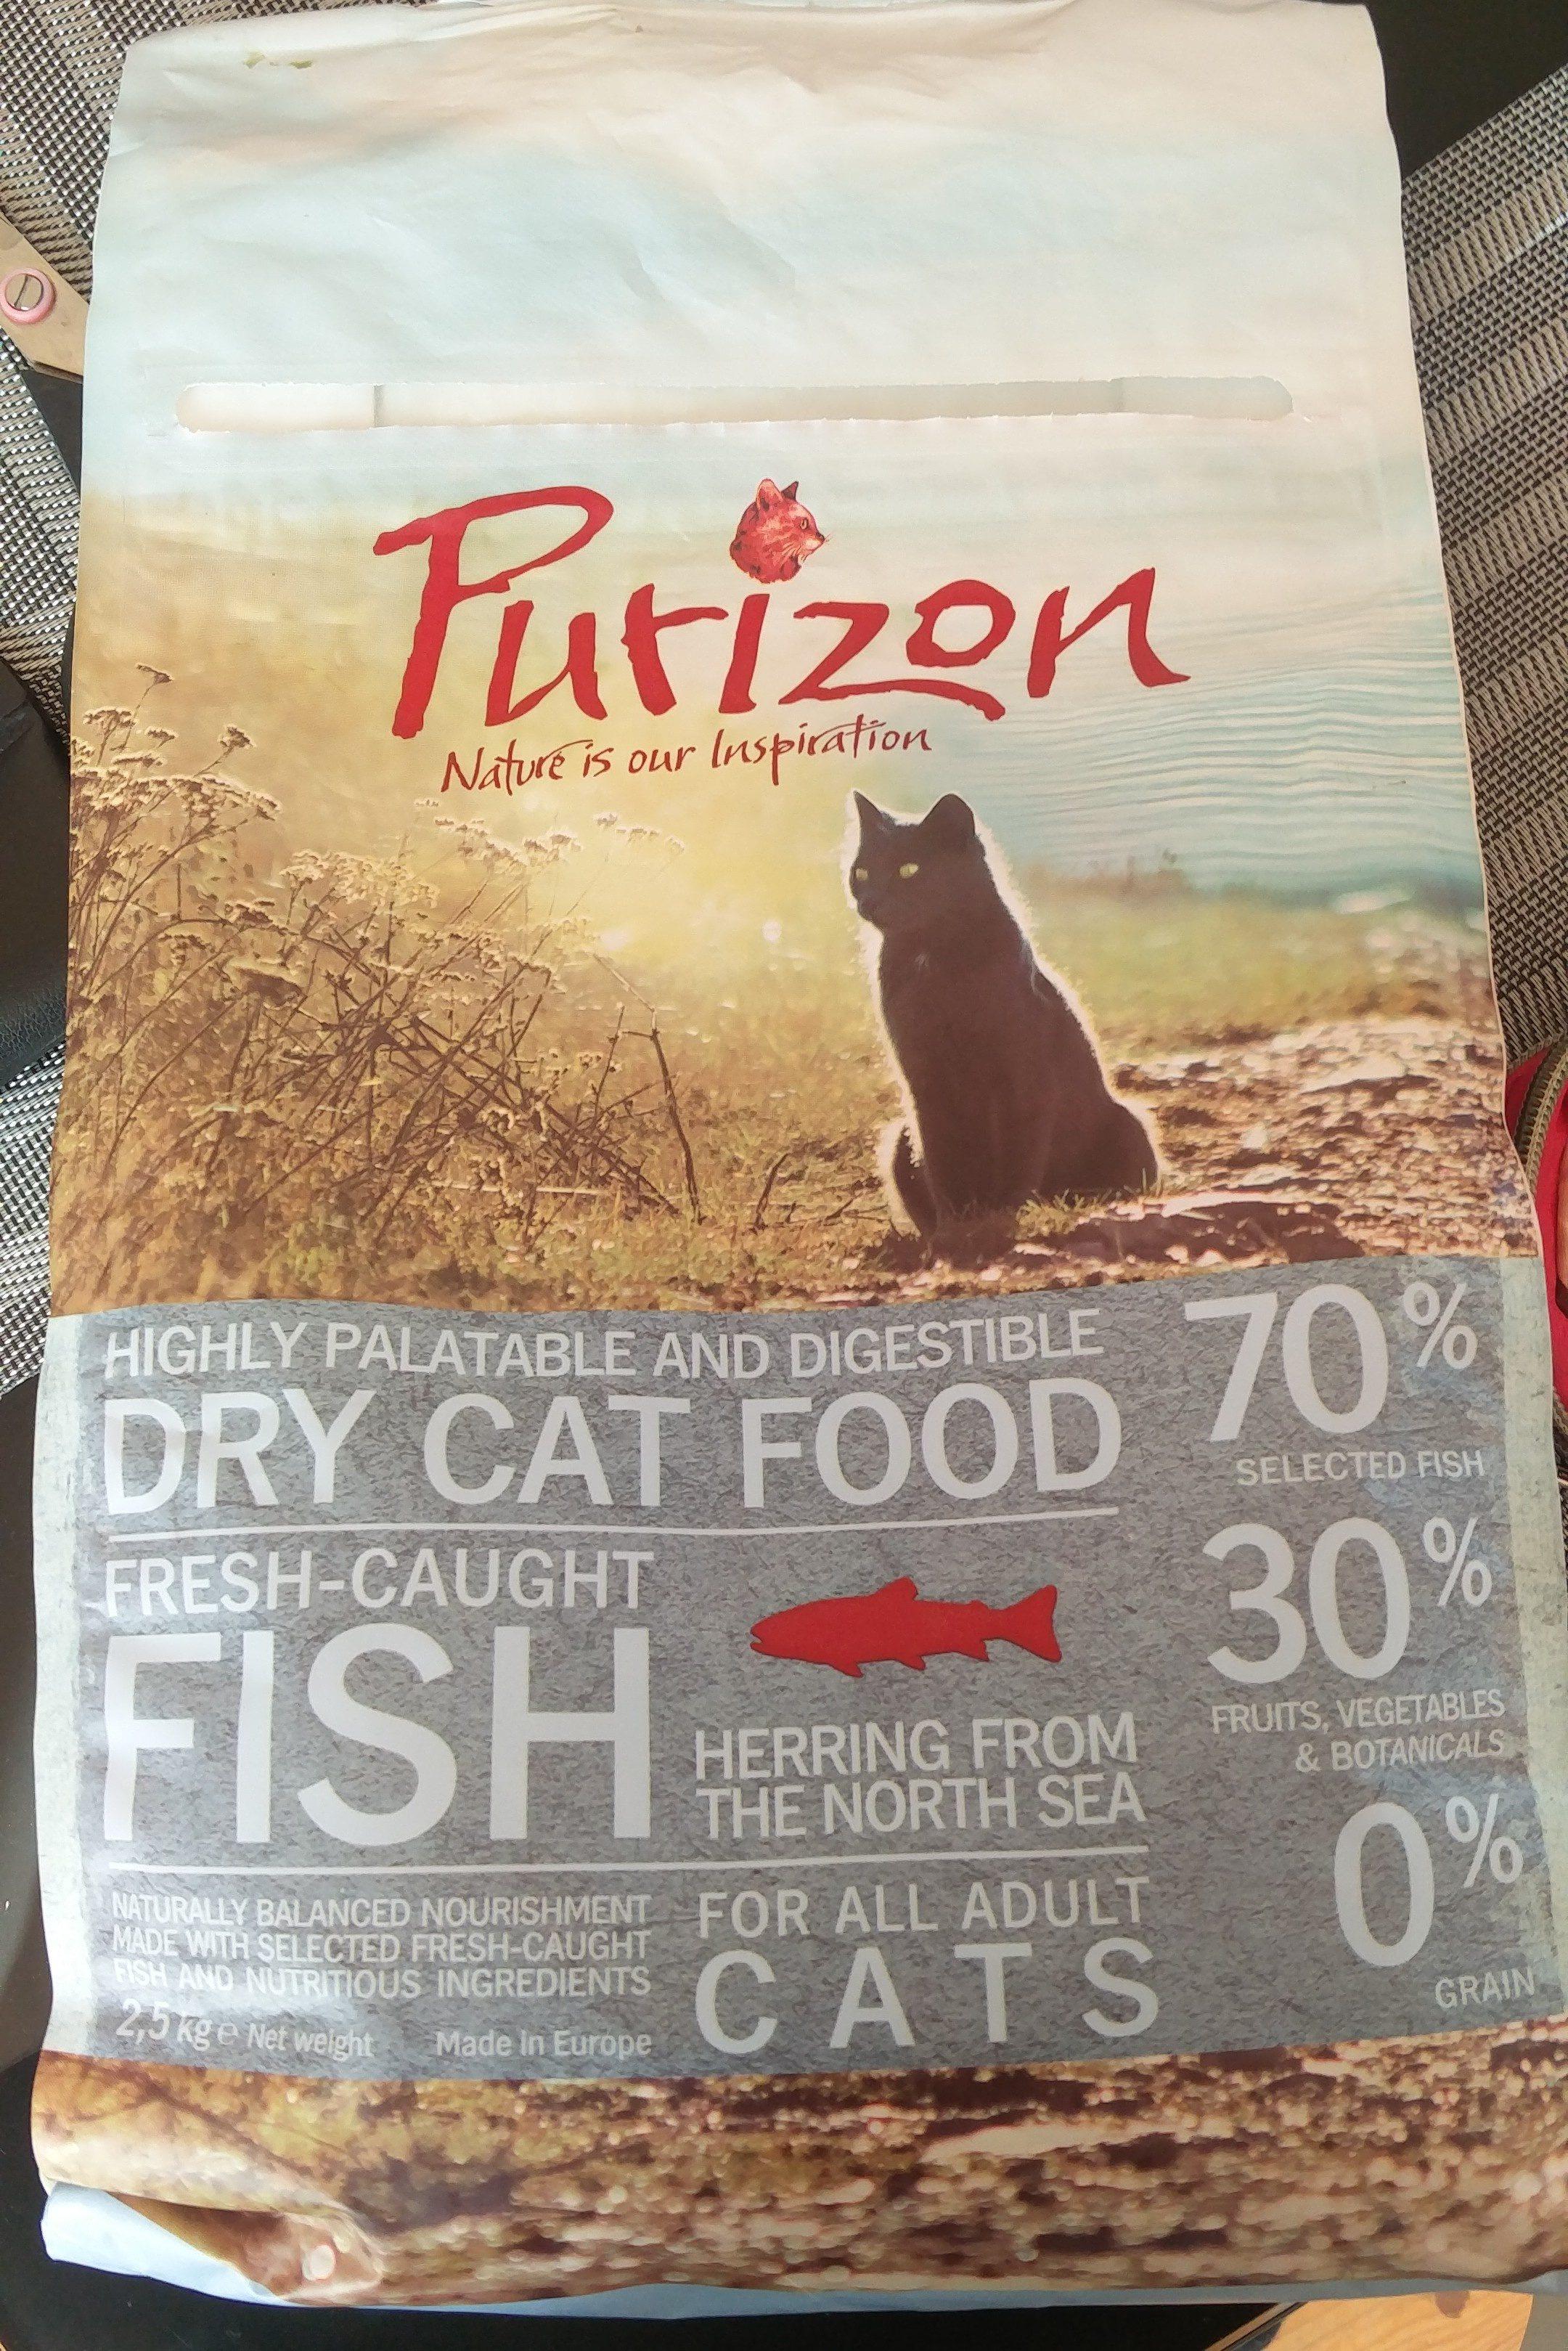 Dry cat food fresh-Caught Fish - Product - fr